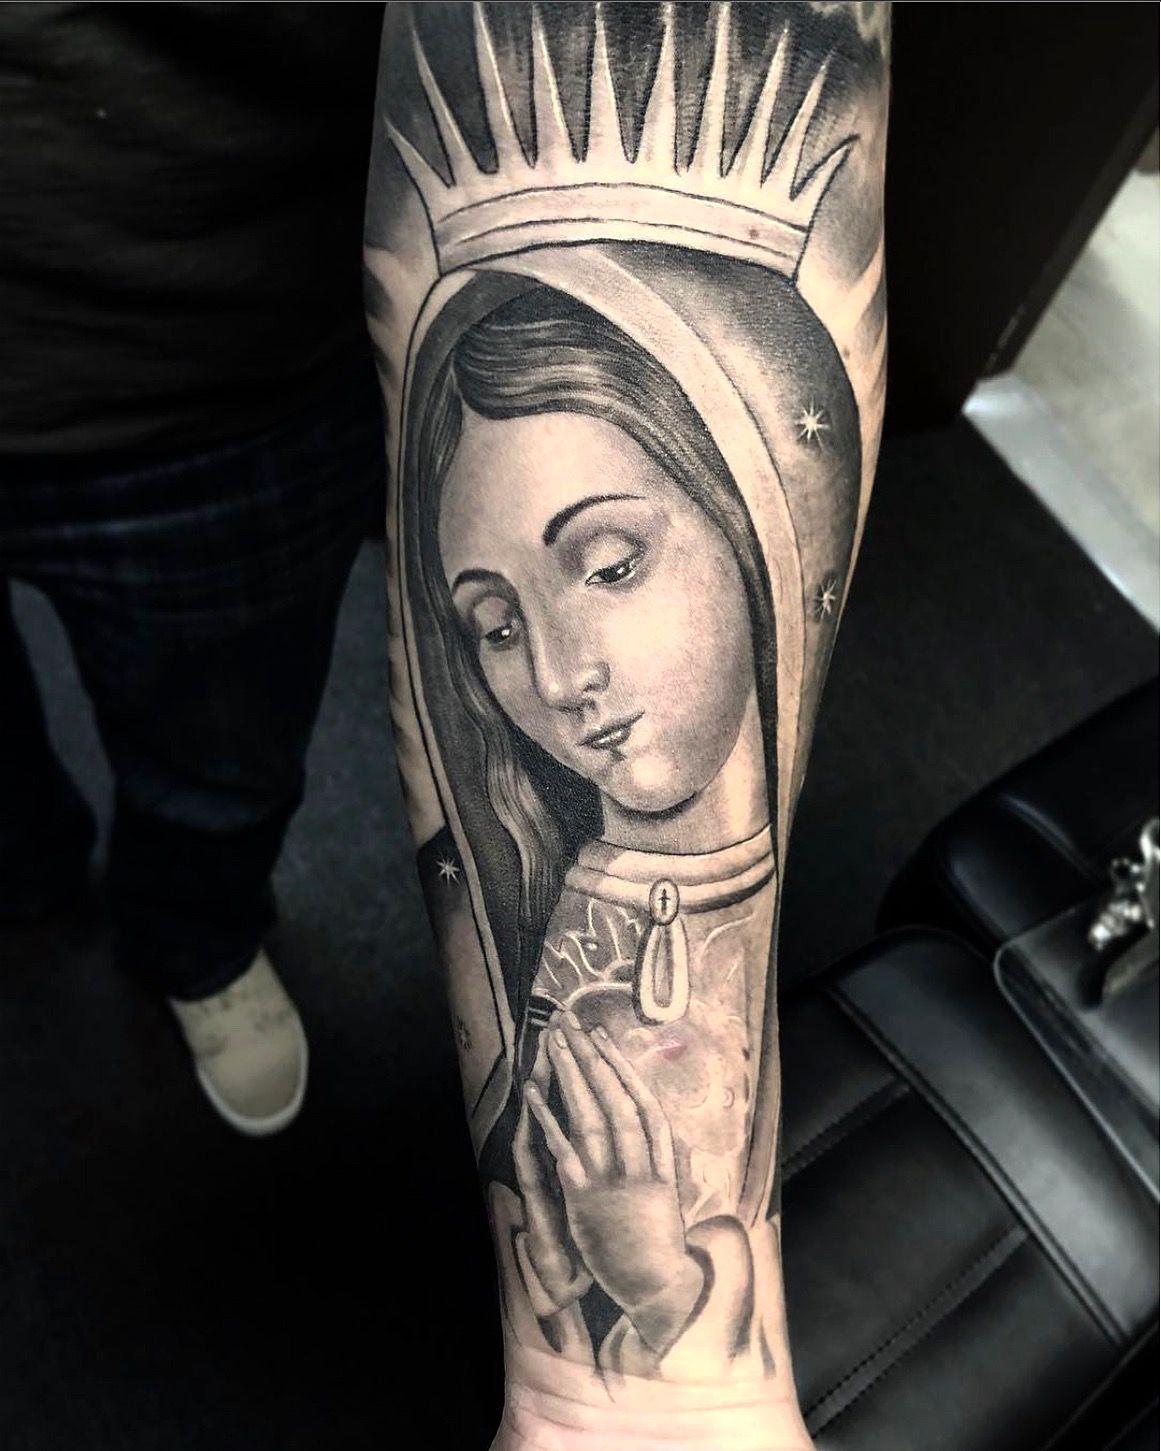 Amazing Artist Jorge Jamaica Jamaica Tatts Awesome Virgin Mary Guadalupe Arm Tattoo Healed View Jo Tatuaje Virgen Maria Tatuaje Virgen Virgen De Guadalupe